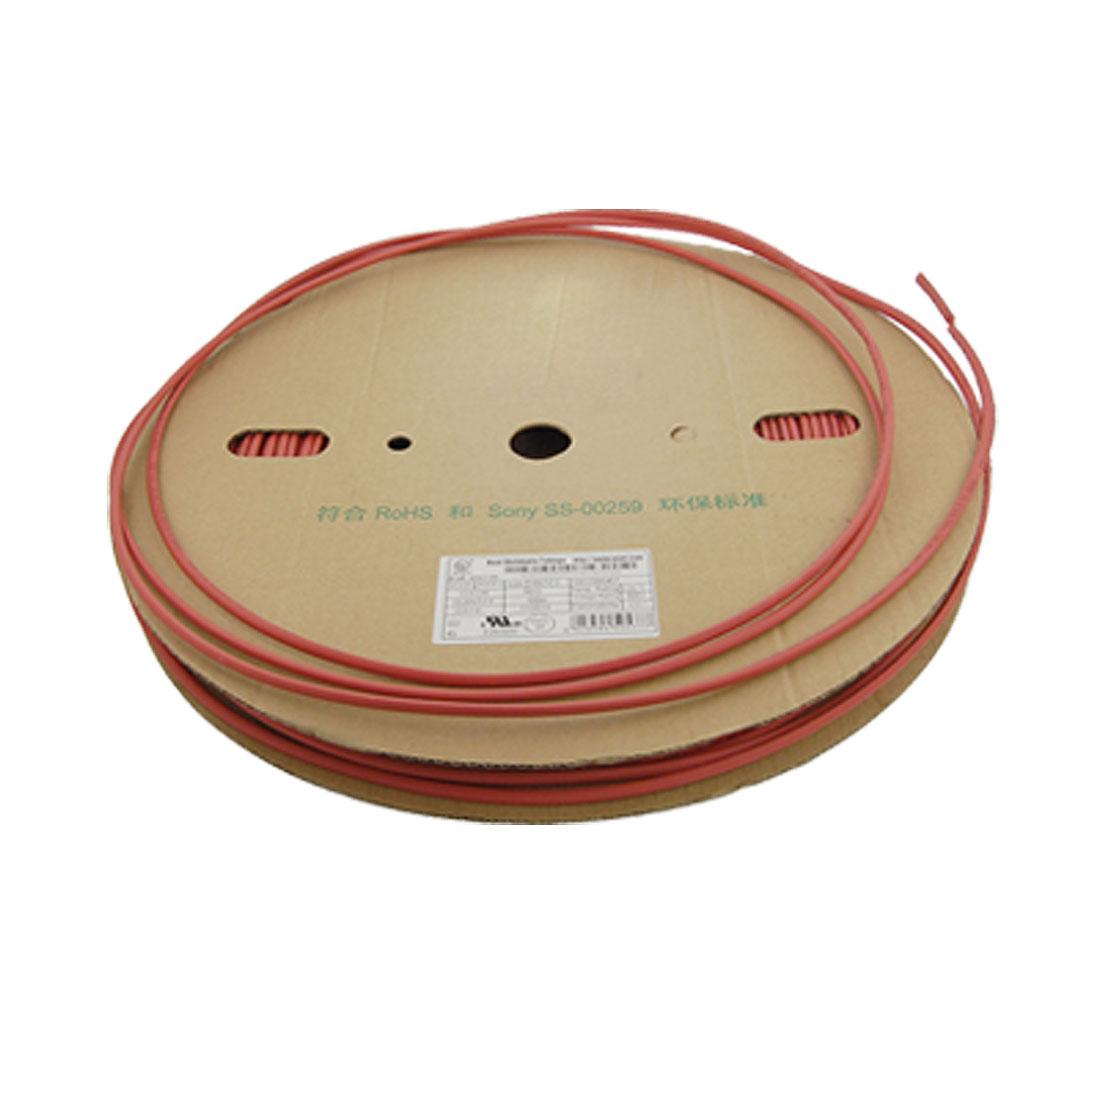 Red 4.5mm x 100 Meters Heat Shrinkable Tubing Tube Roll